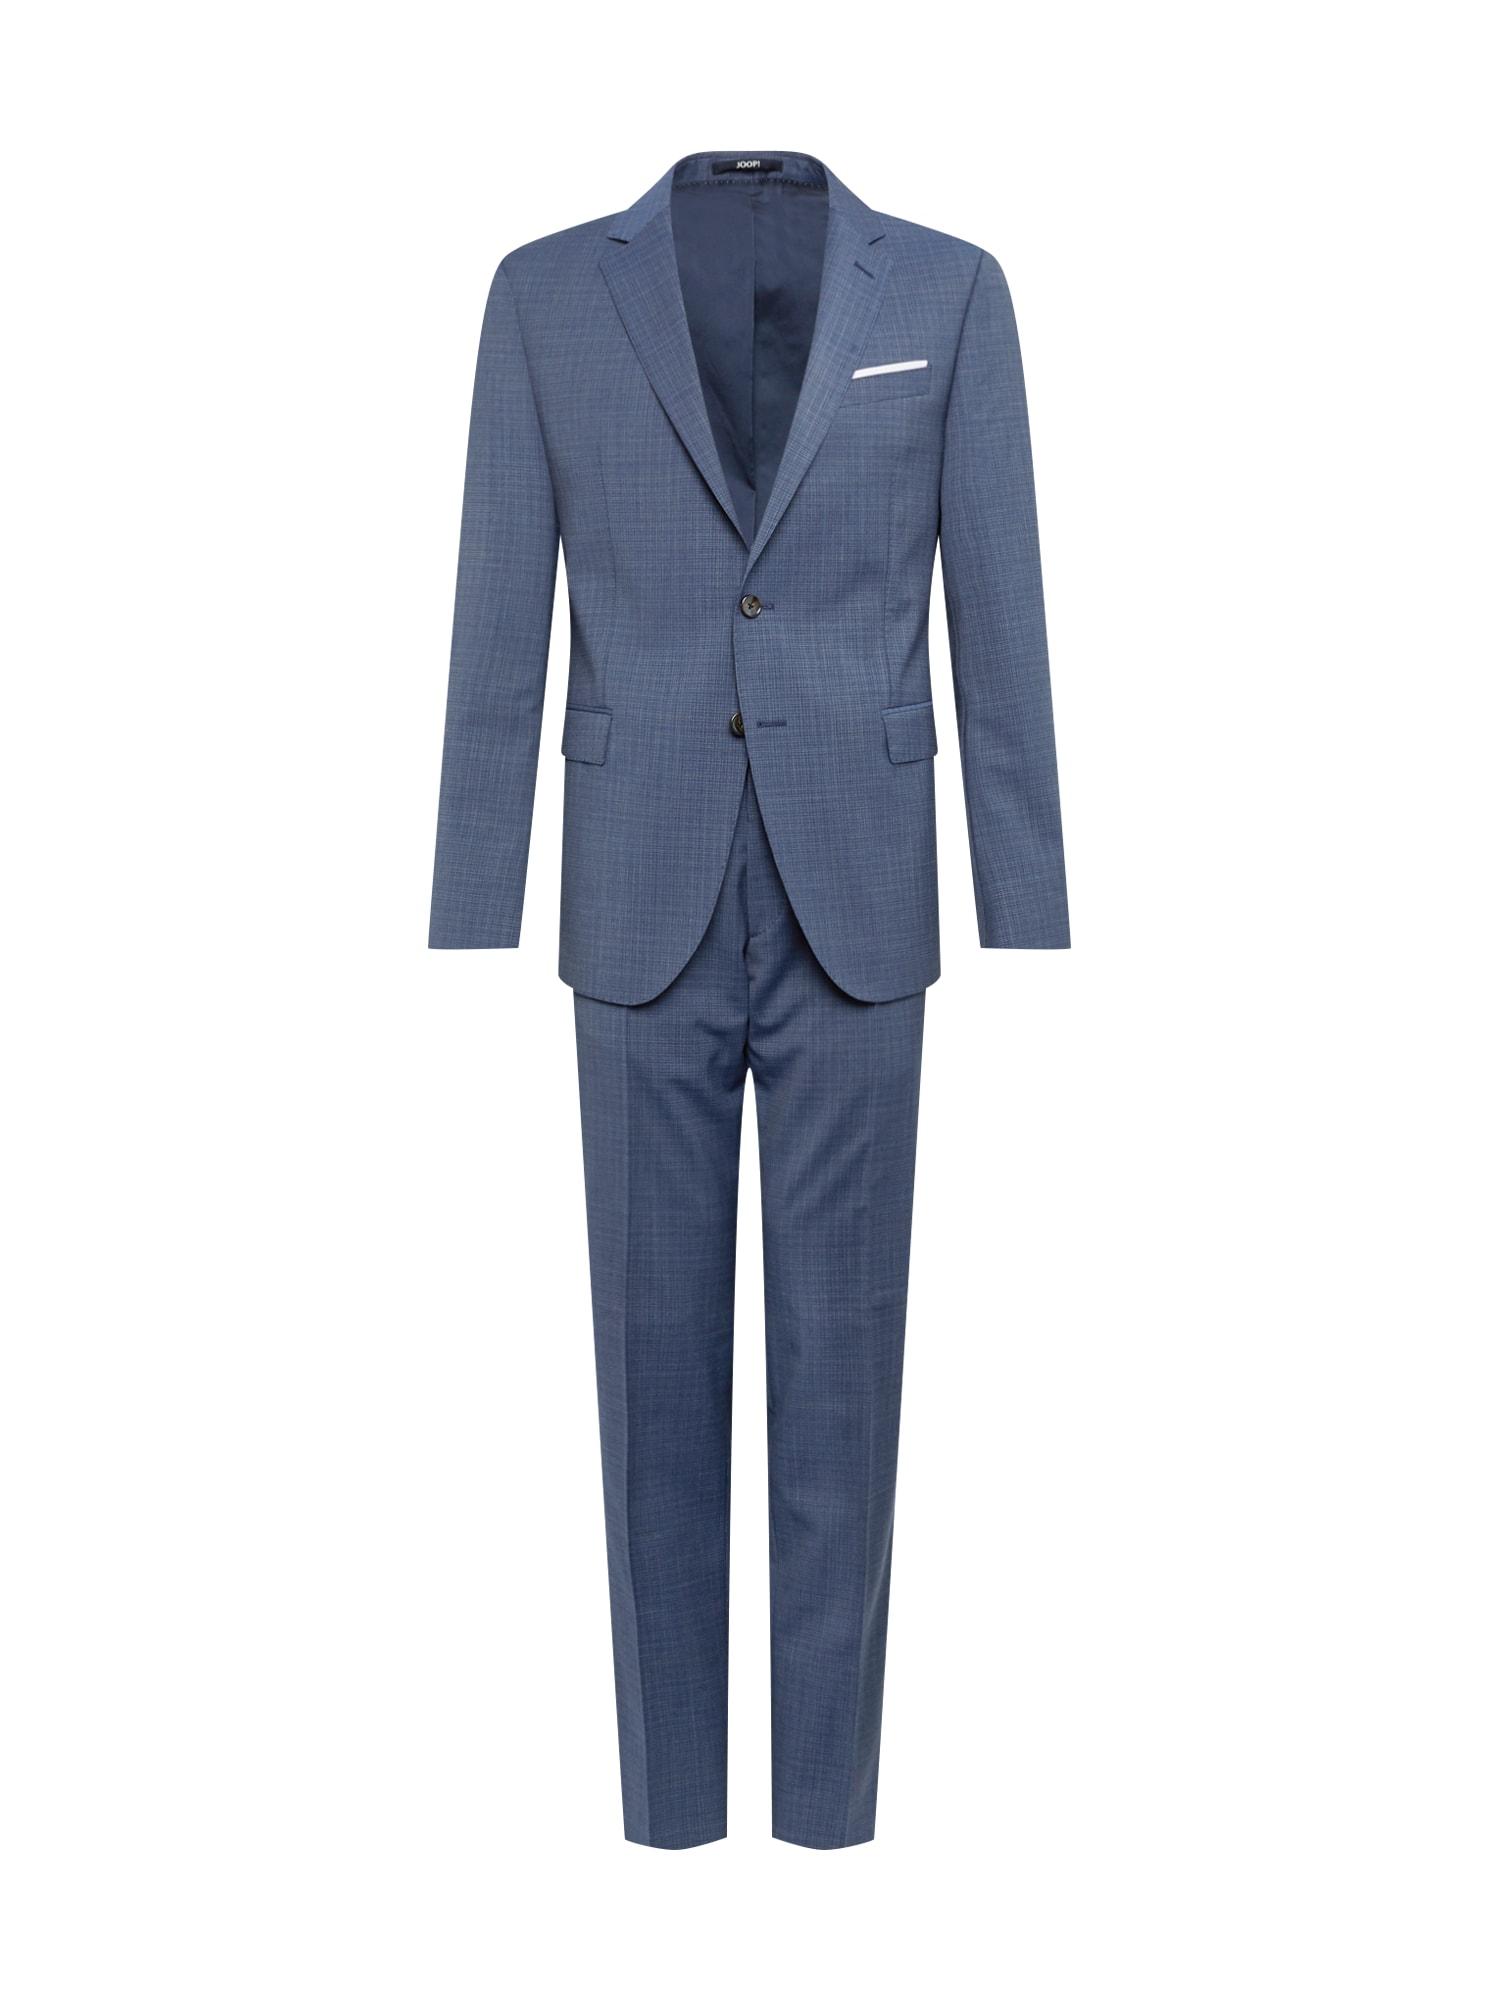 Oblek 17 JS-Herby-Blayr-STR 10008024 tmavě modrá JOOP!